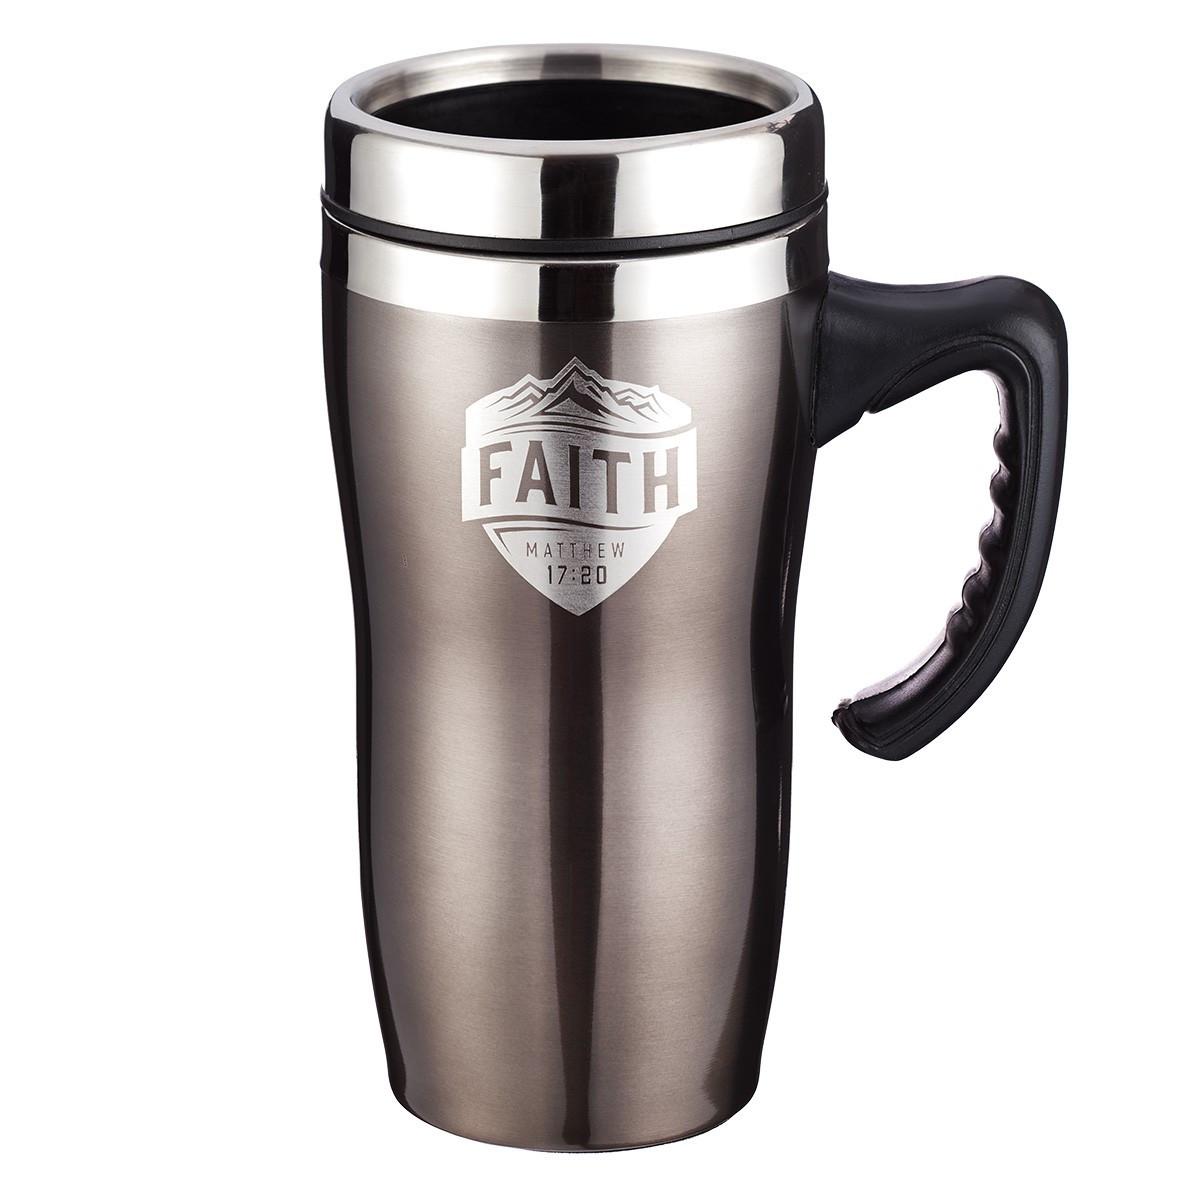 faith matthew 17 20 stainless steel travel mug